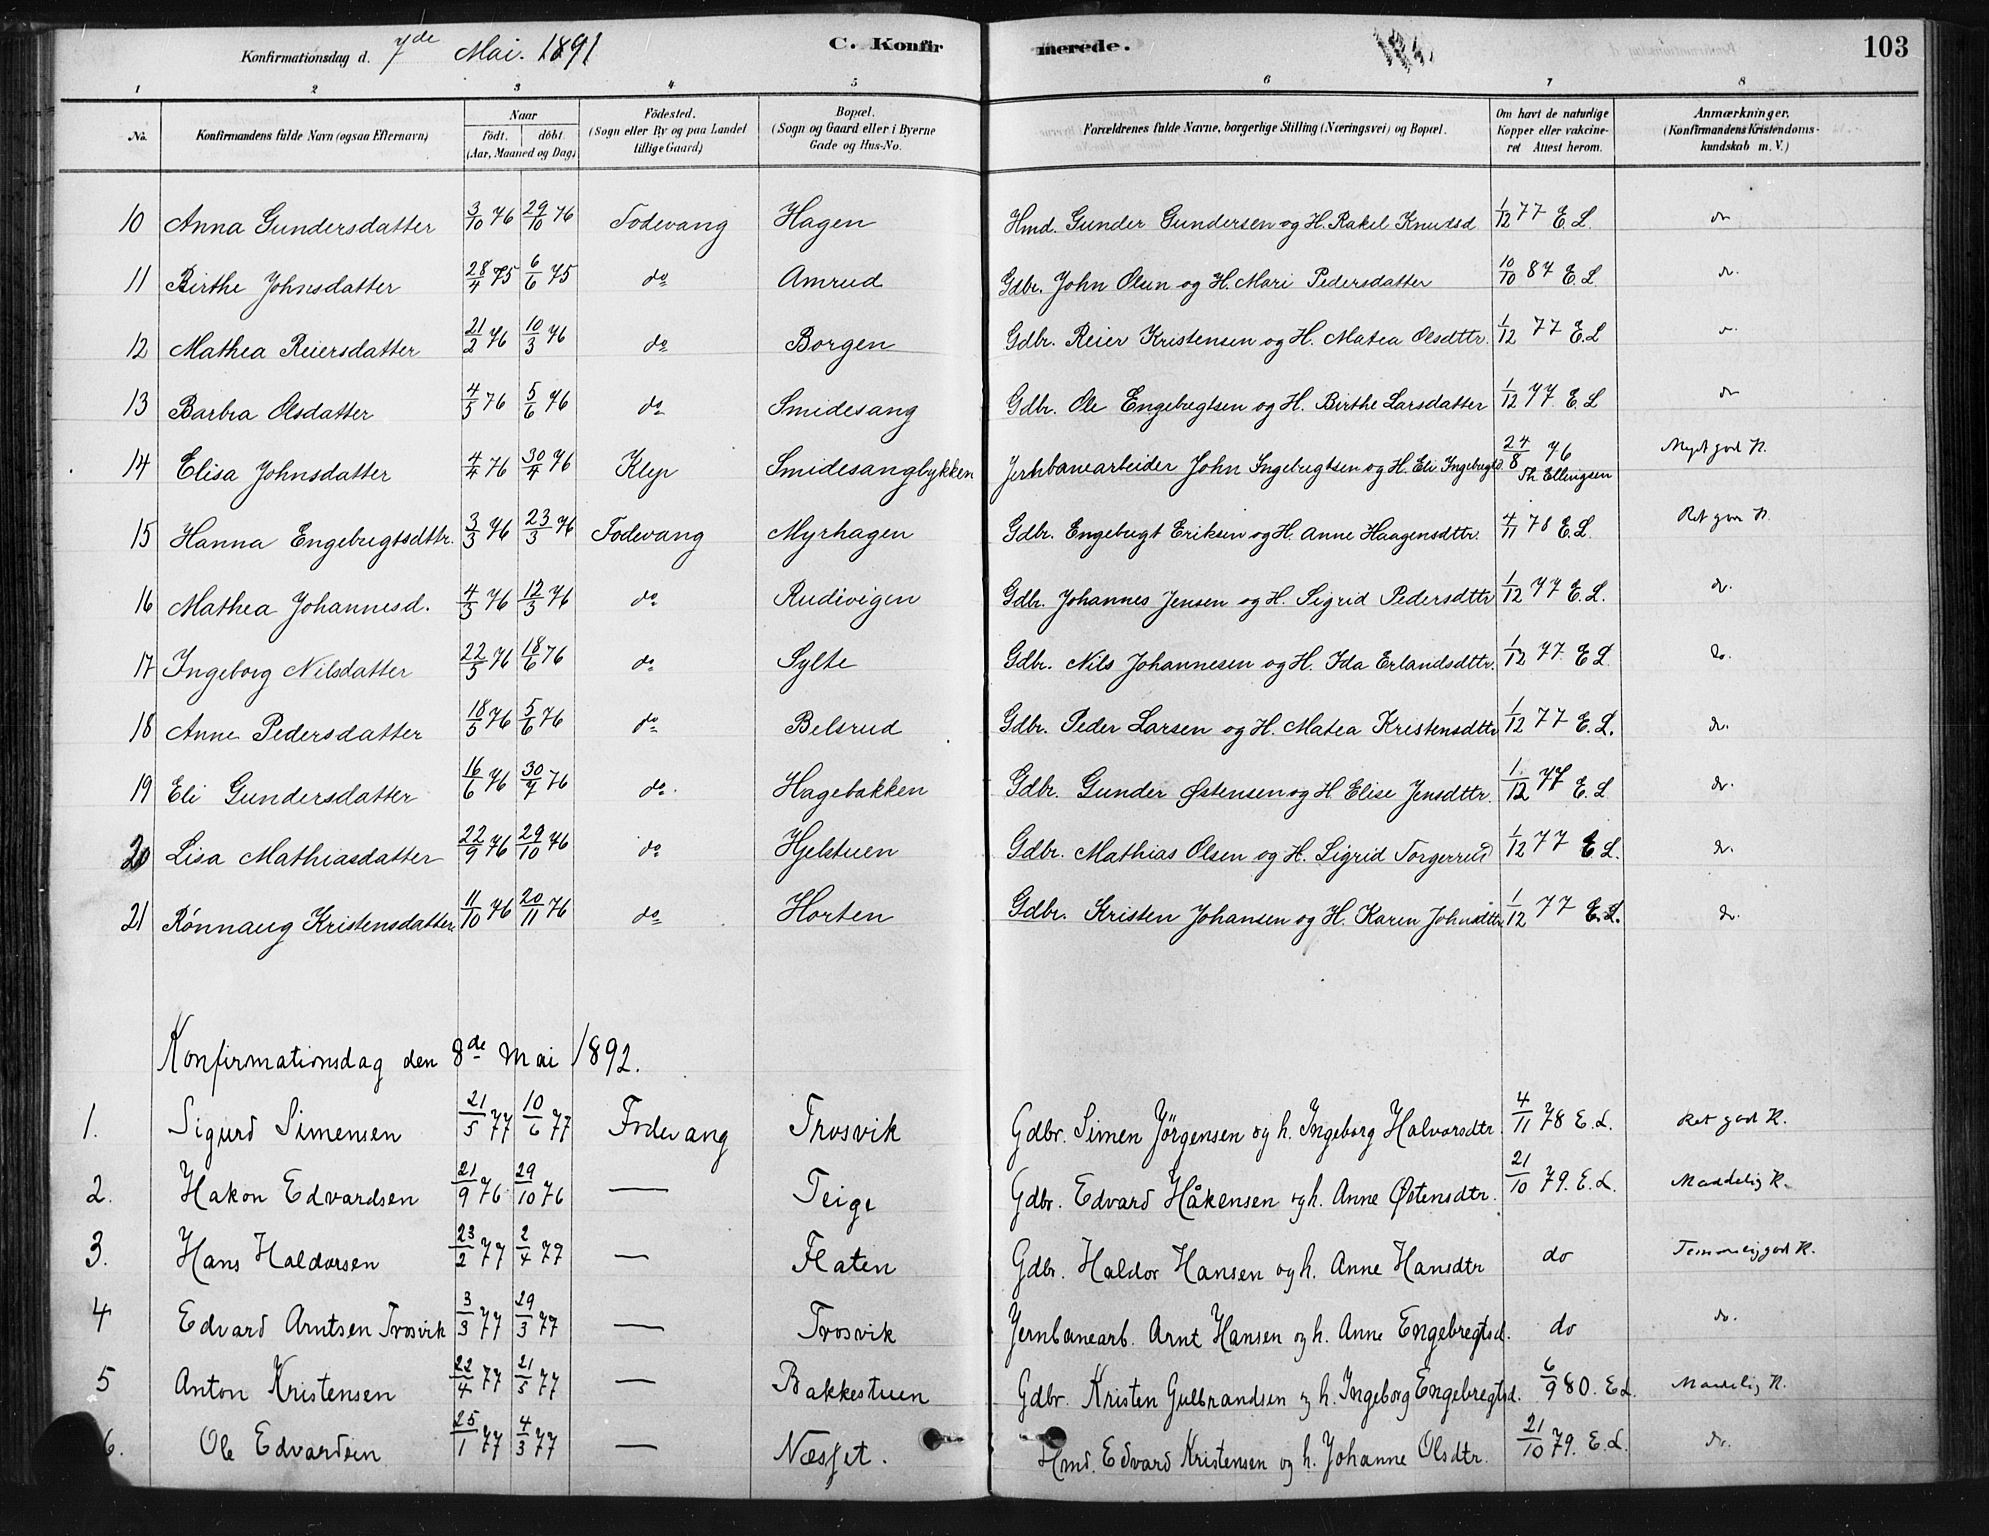 SAH, Ringebu prestekontor, Ministerialbok nr. 9, 1878-1898, s. 103